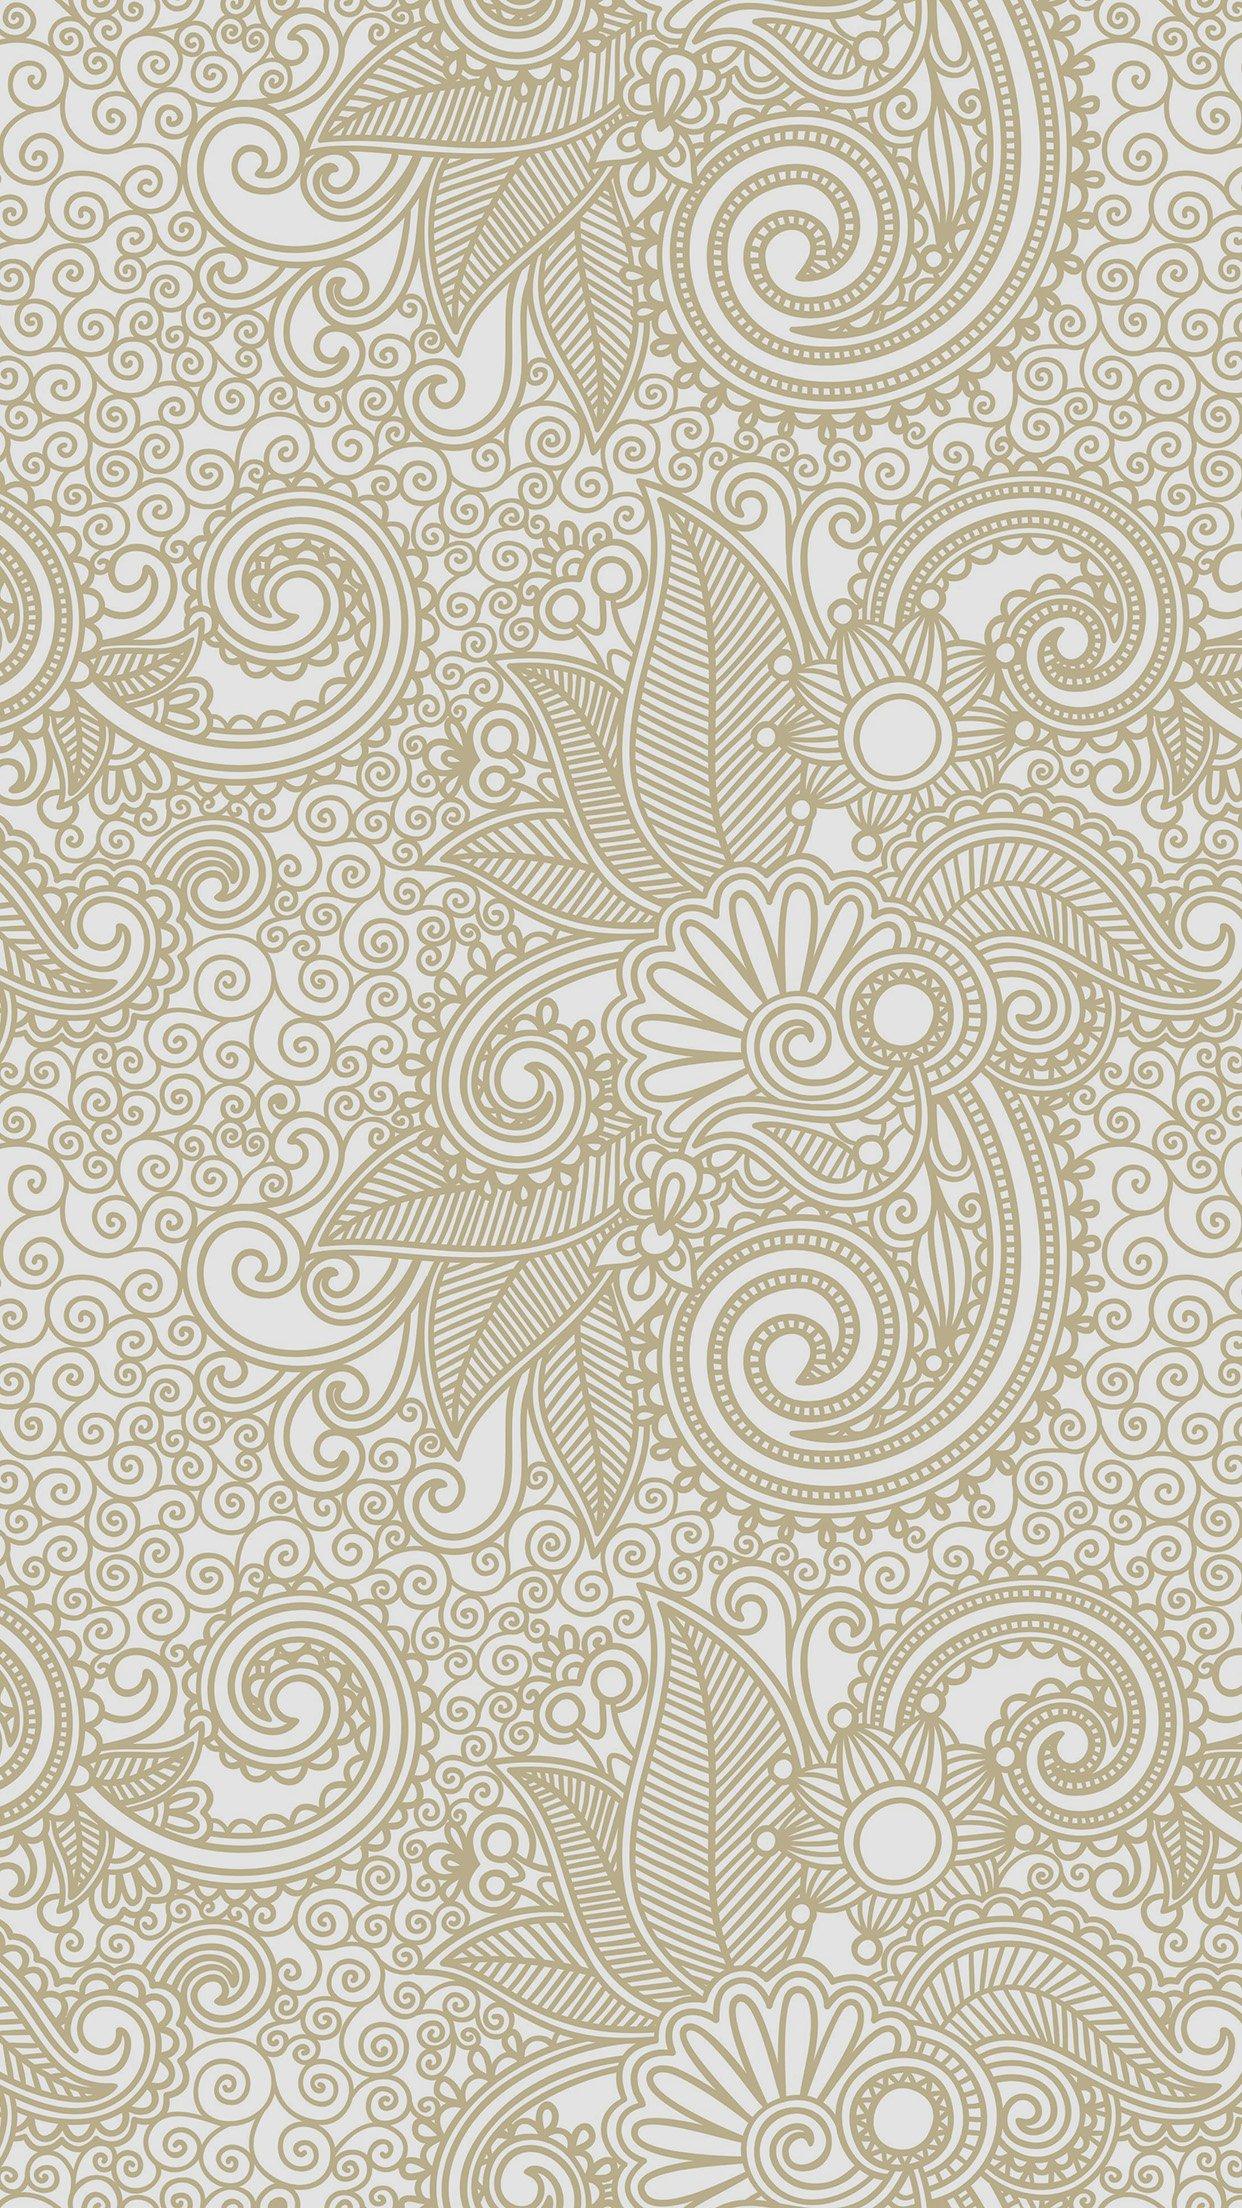 wallpaper design flower line pattern 34 iphone6 plus wallpaperjpg 1242x2208